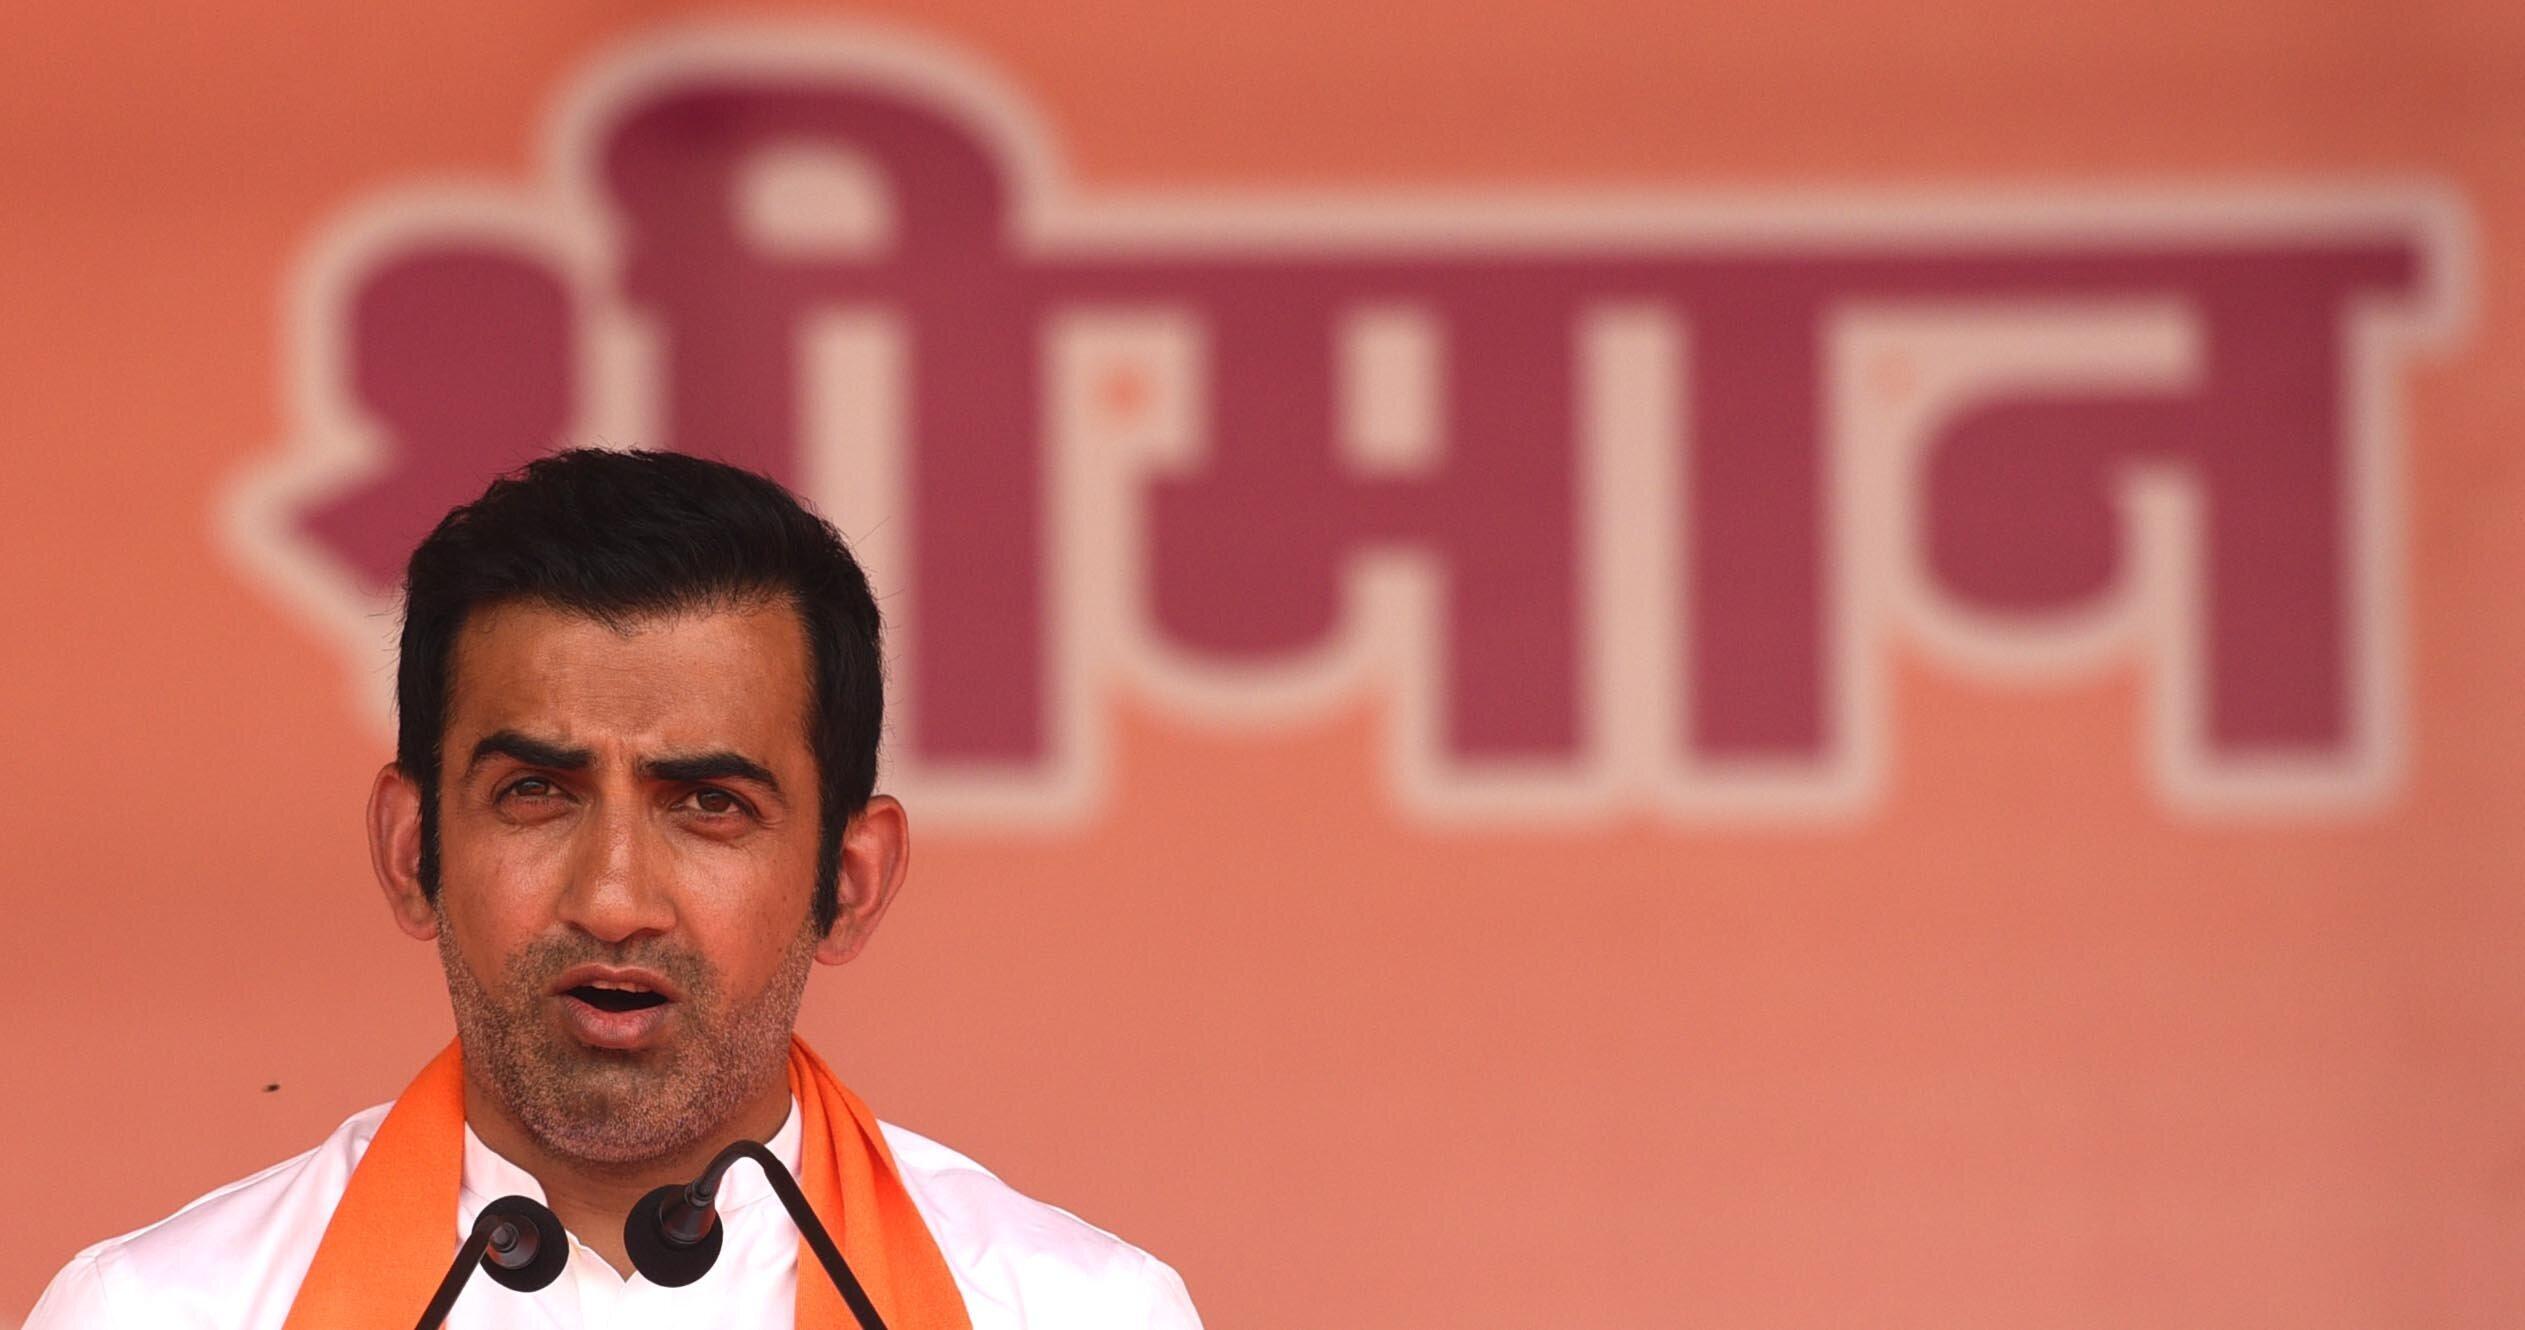 BJP's Gautam Gambhir Faces Tough Contest From AAP's Atishi In East